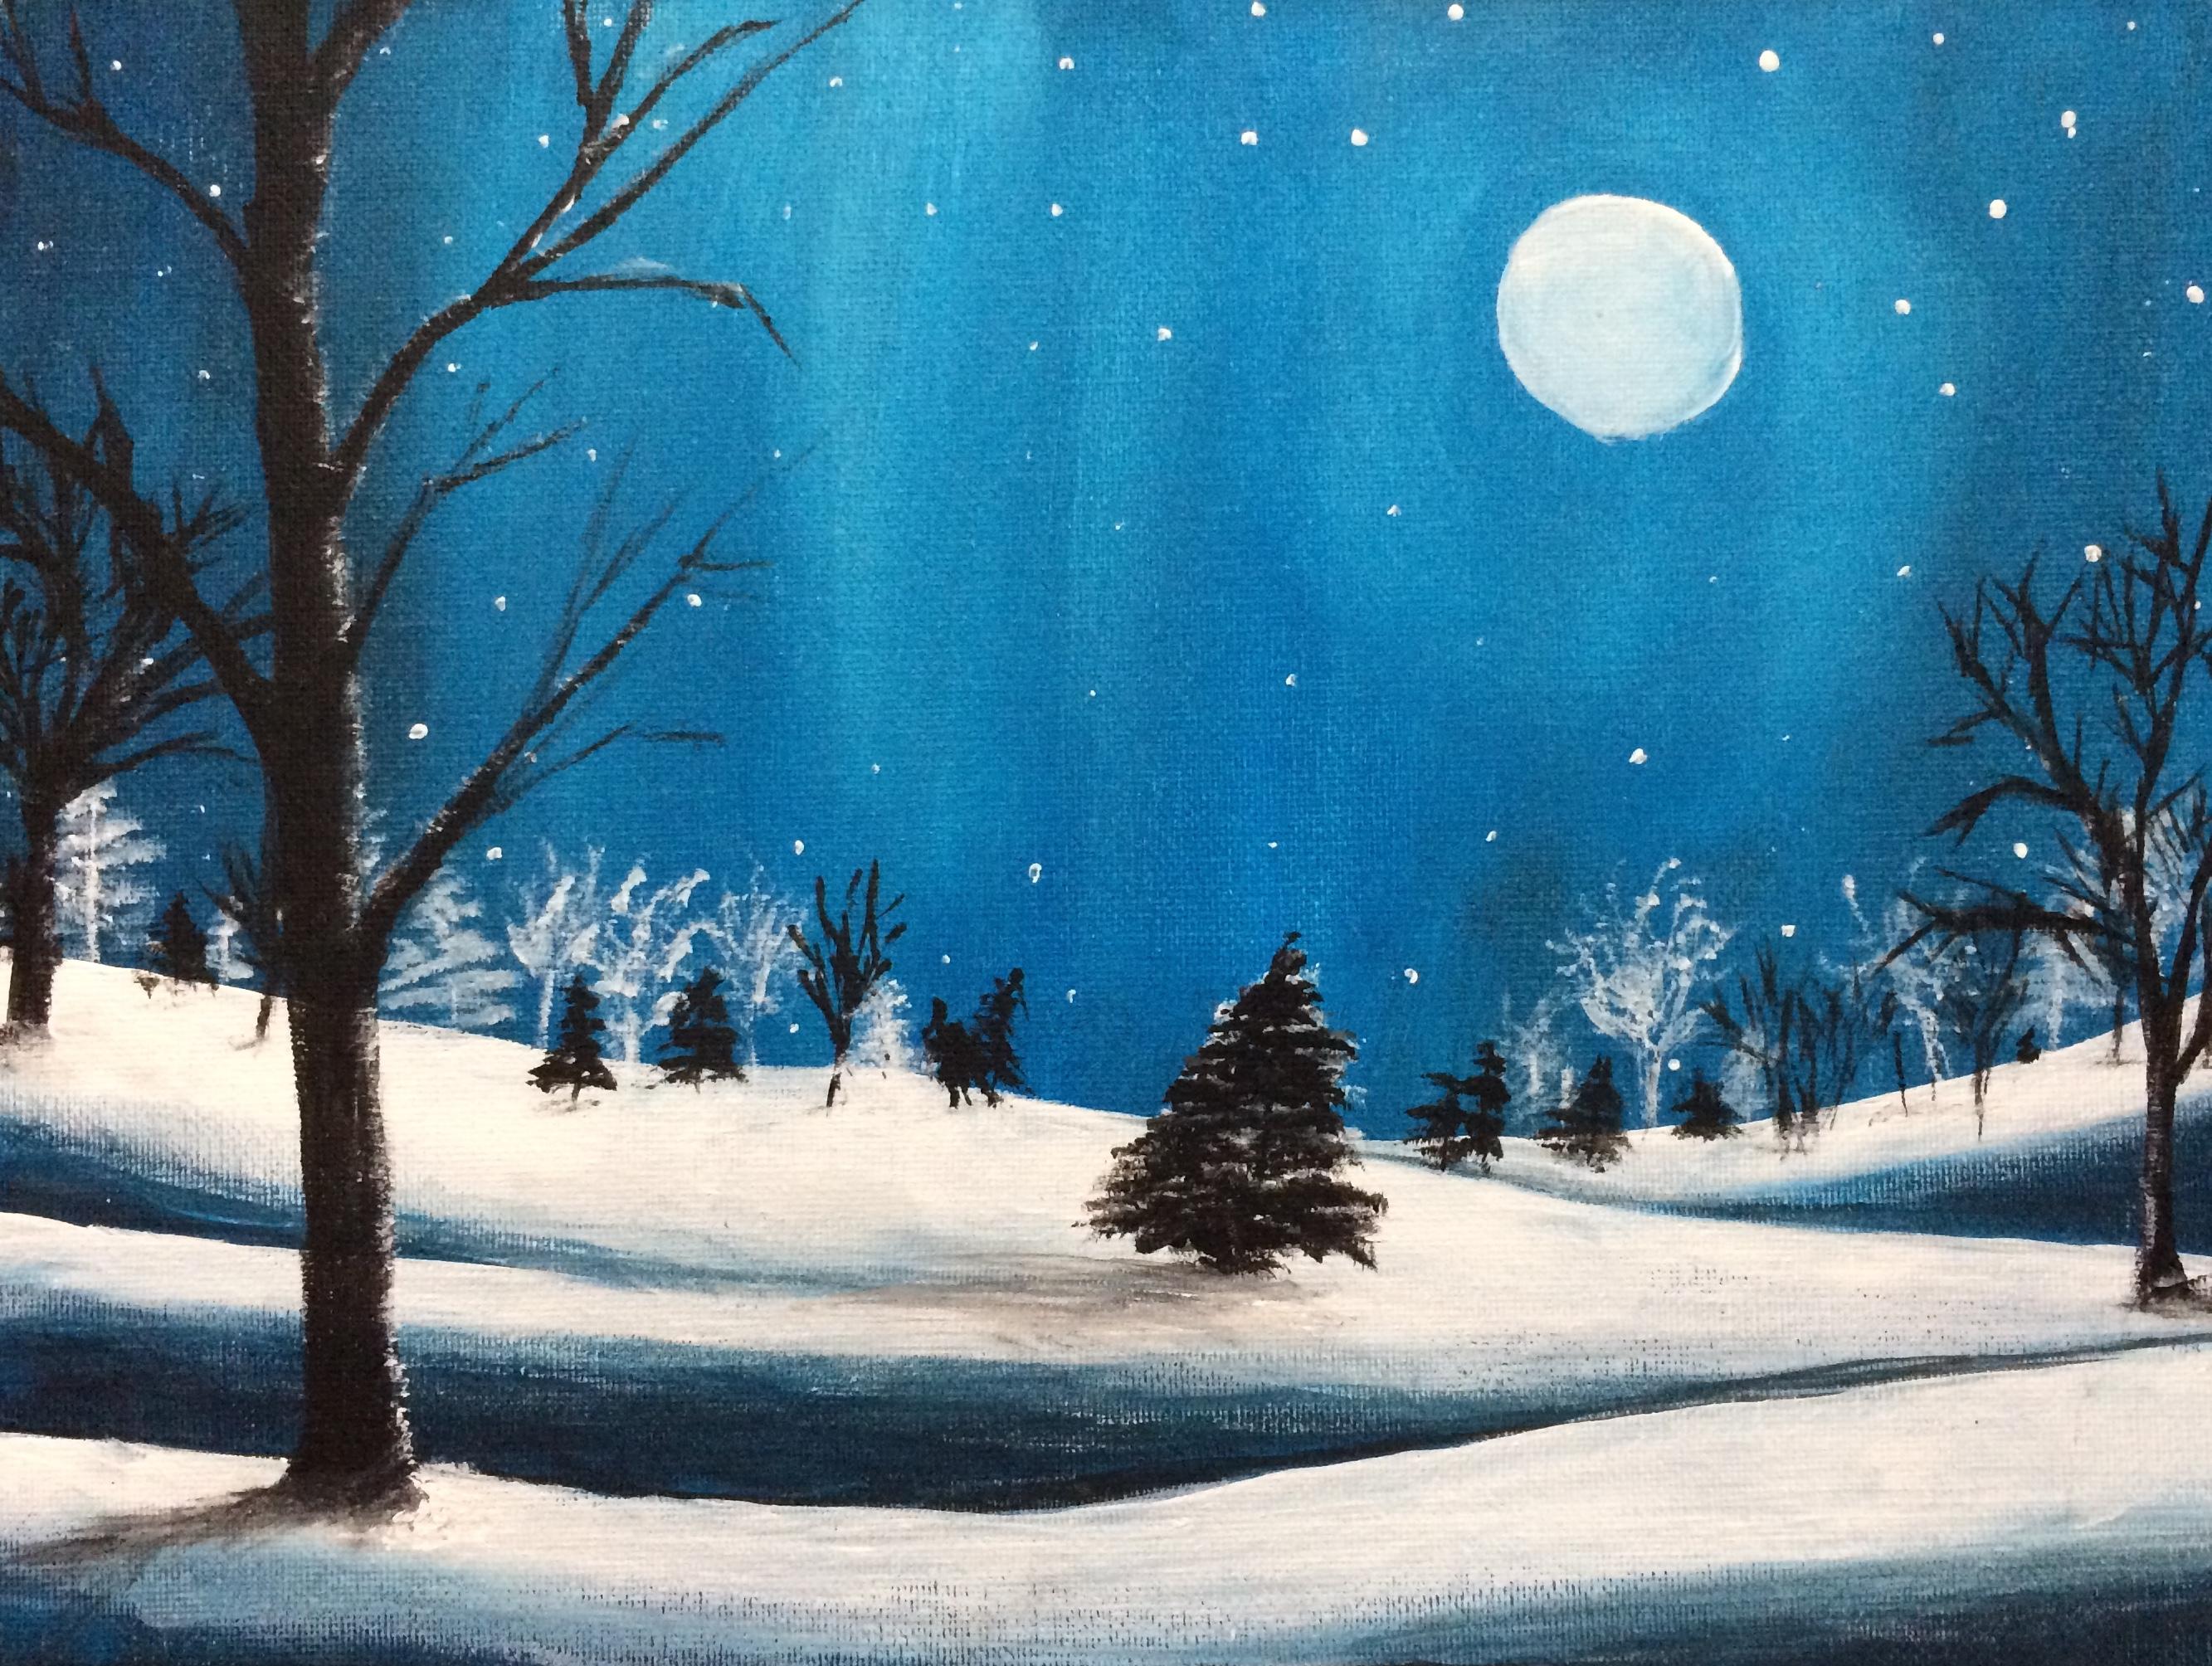 Moonlit Snow Trees